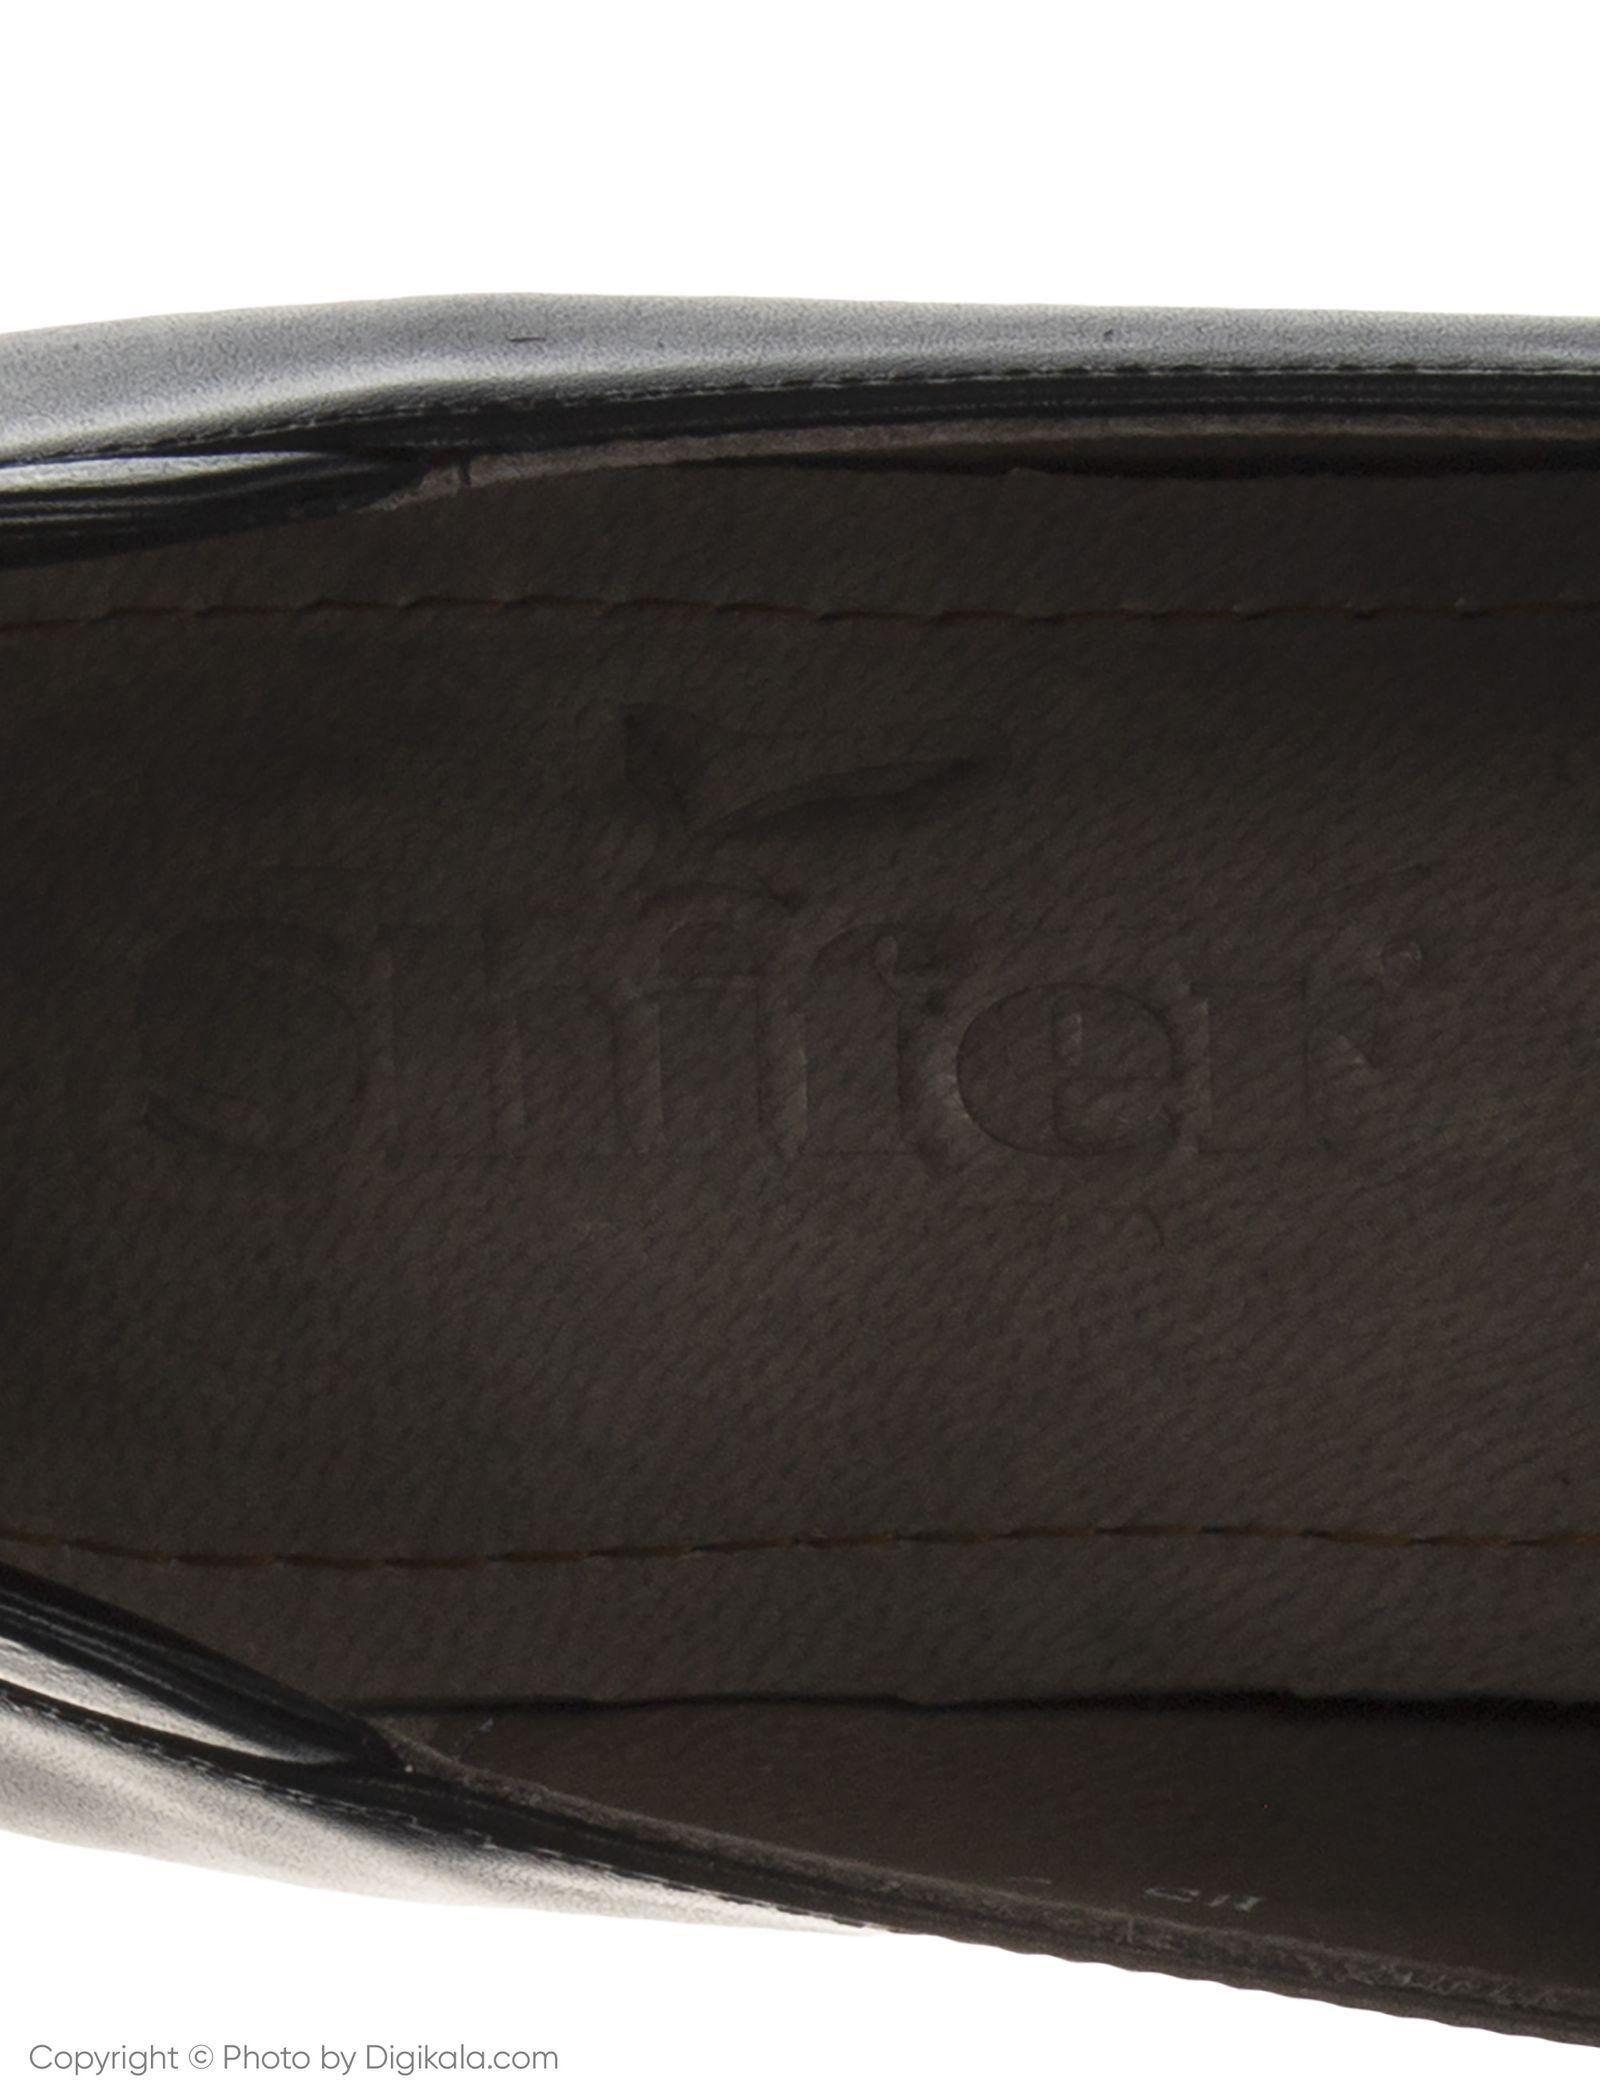 کفش روزمره زنانه شیفر مدل 5190A-101 -  - 7